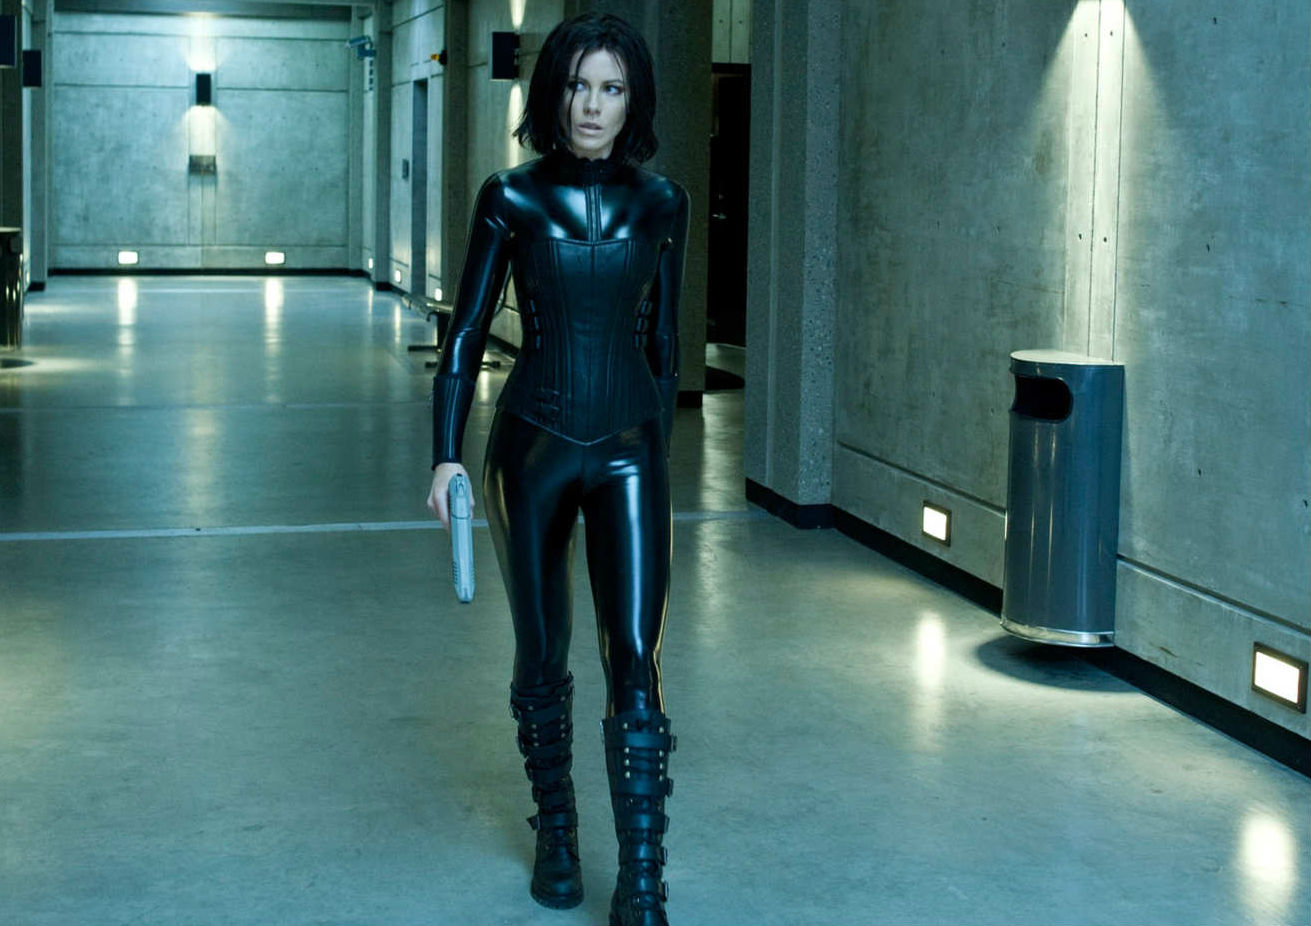 Kate Beckinsale Reveals Reason She Wouldn't Make Another 'Underworld' Movie  | ETCanada.com